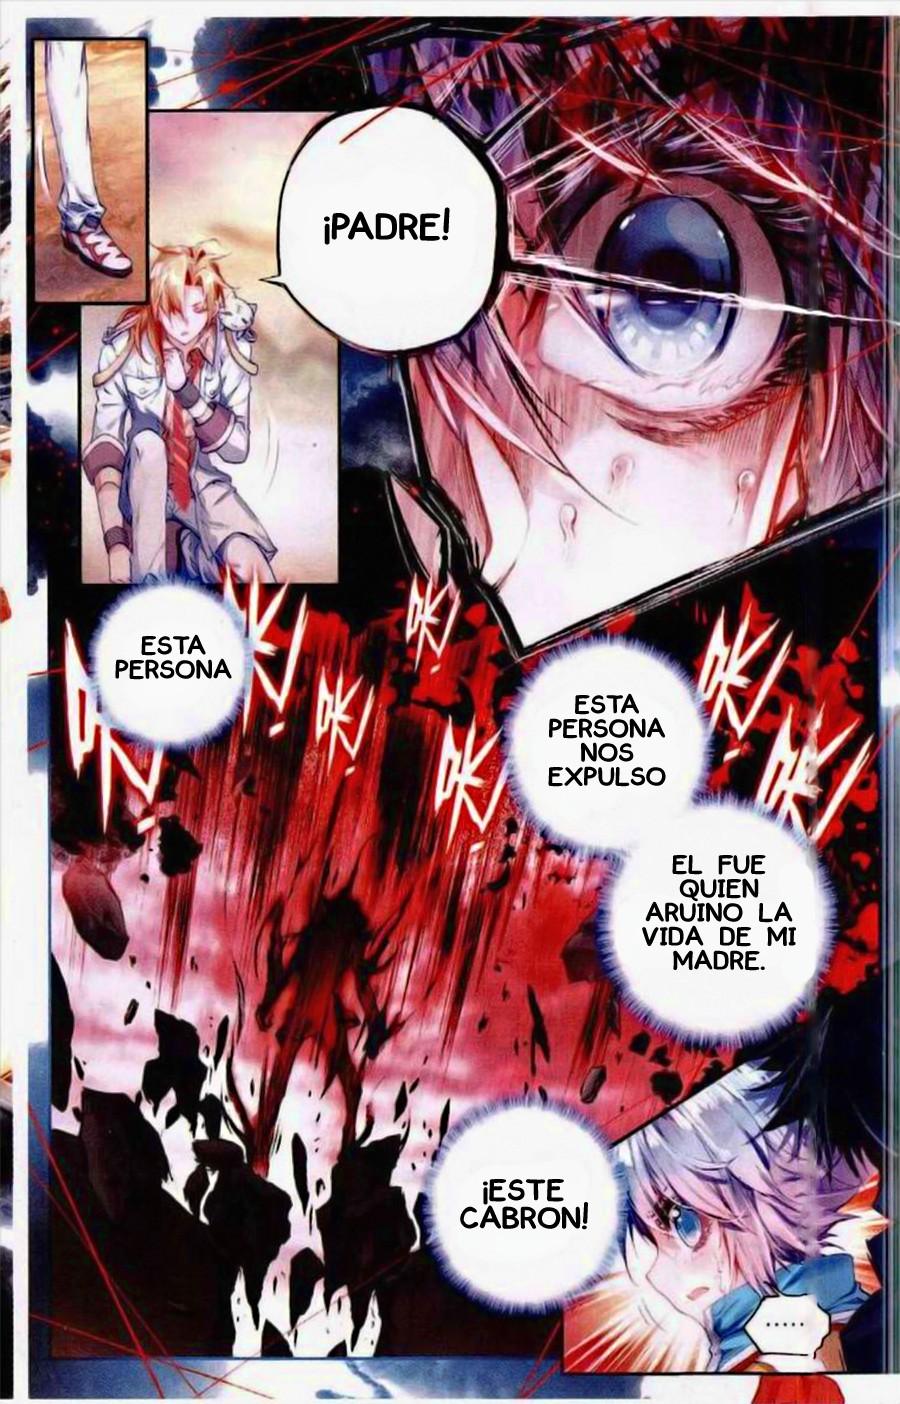 http://c5.ninemanga.com/es_manga/33/16417/435618/c90b7a69d23093b5eecacda3cf61c3a1.jpg Page 5